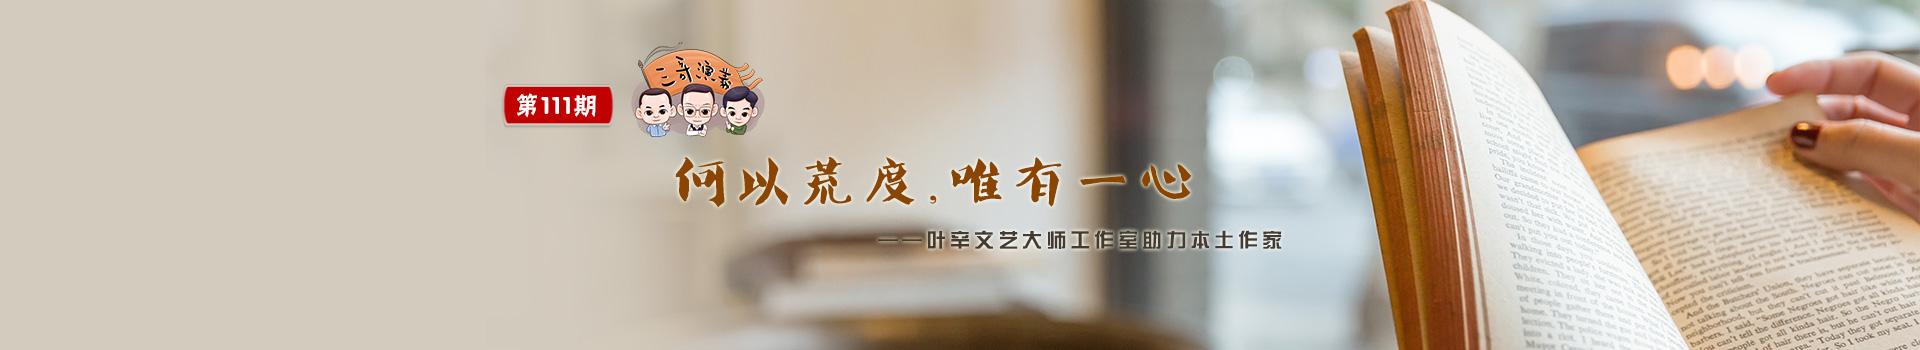 No.111三哥演义